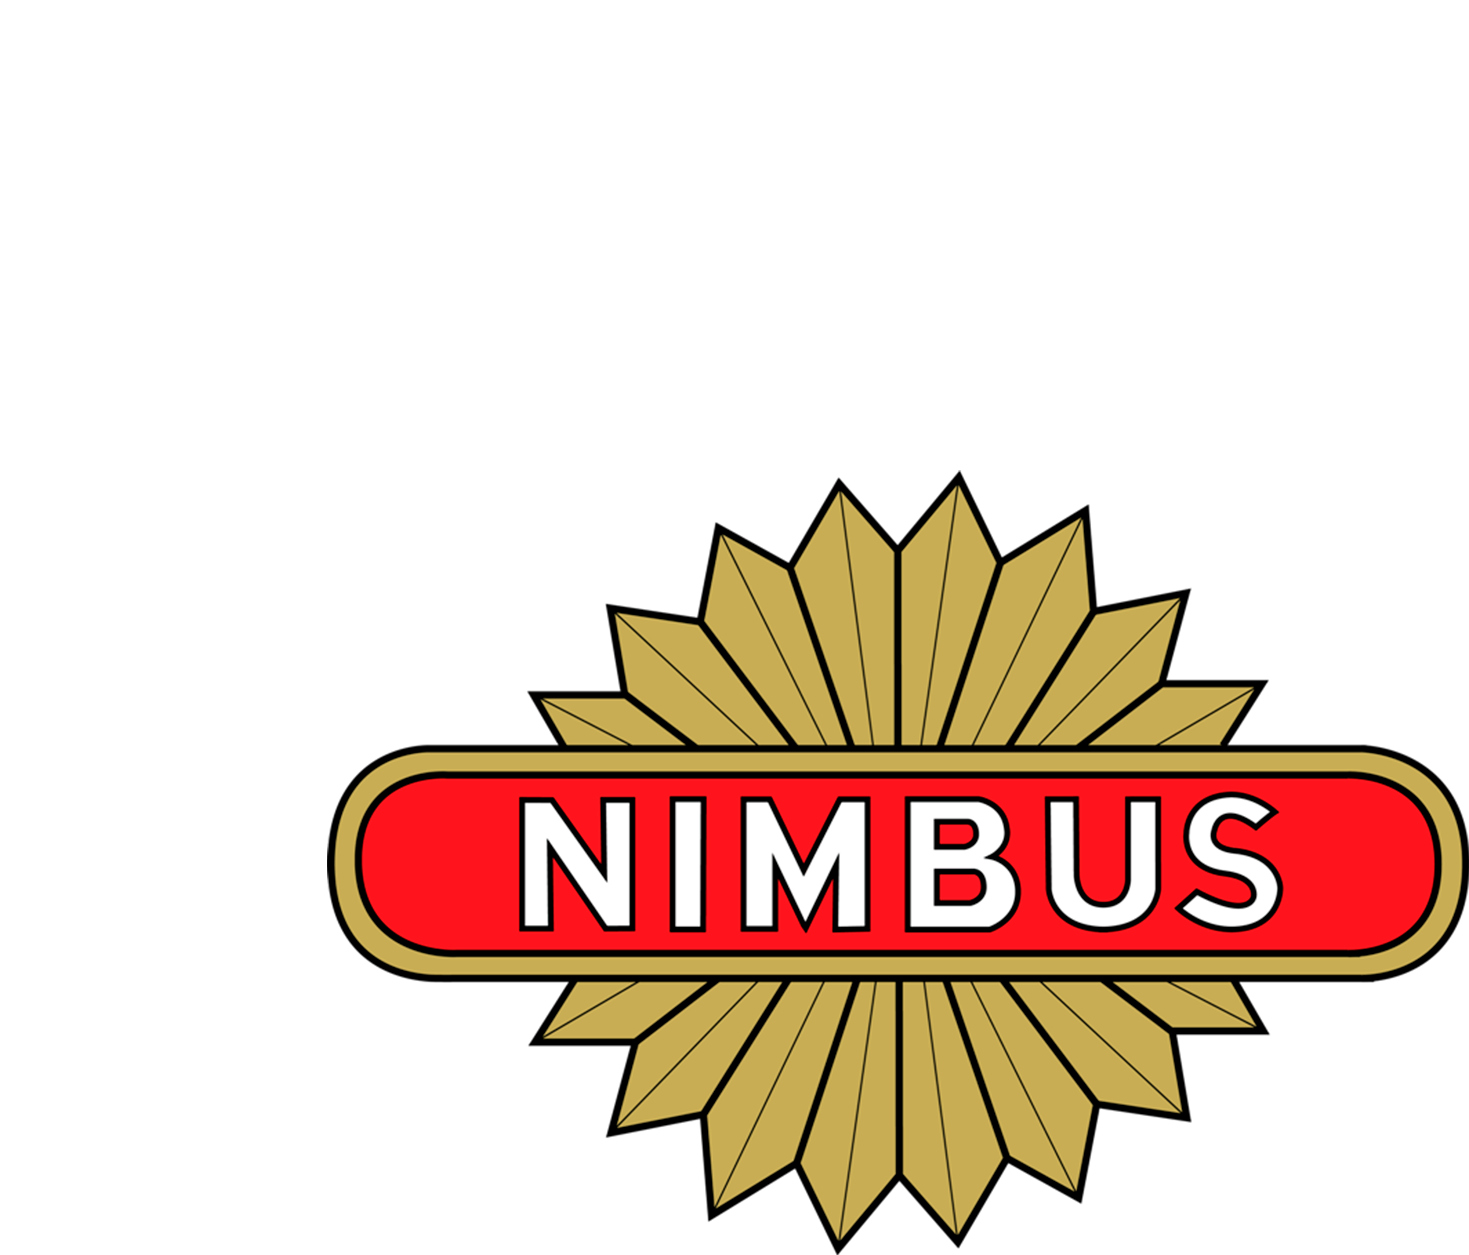 Nimbus Motorcycles Danmark A/S